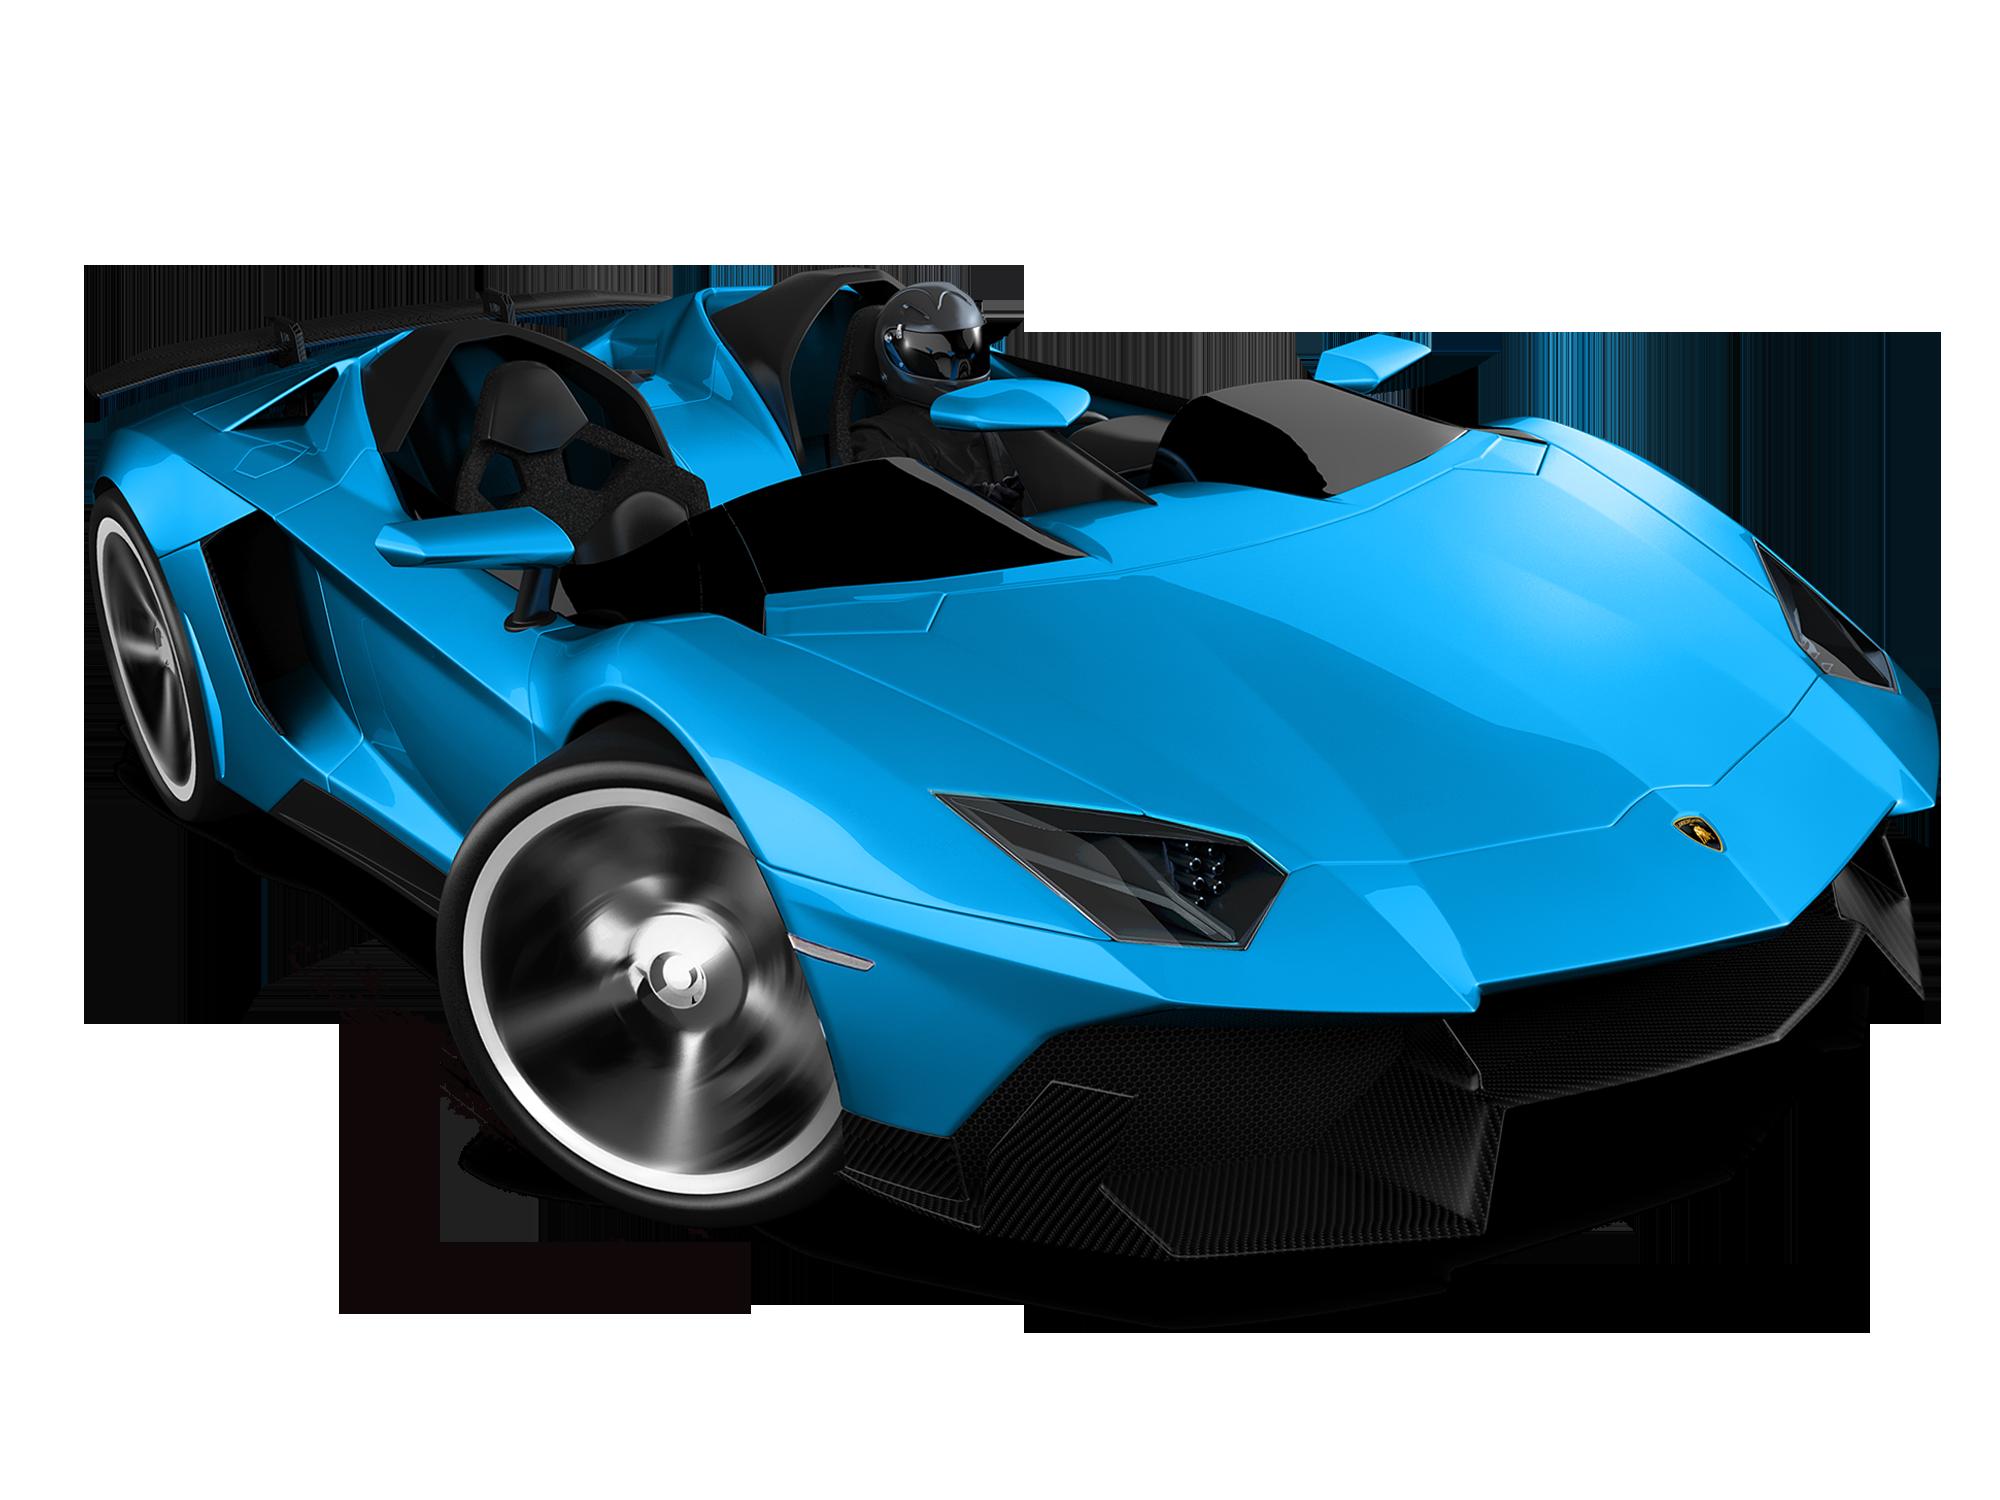 mattel hot wheels diecast car 39 69 corvette 2014 purple kabir hot wheels cars hot. Black Bedroom Furniture Sets. Home Design Ideas